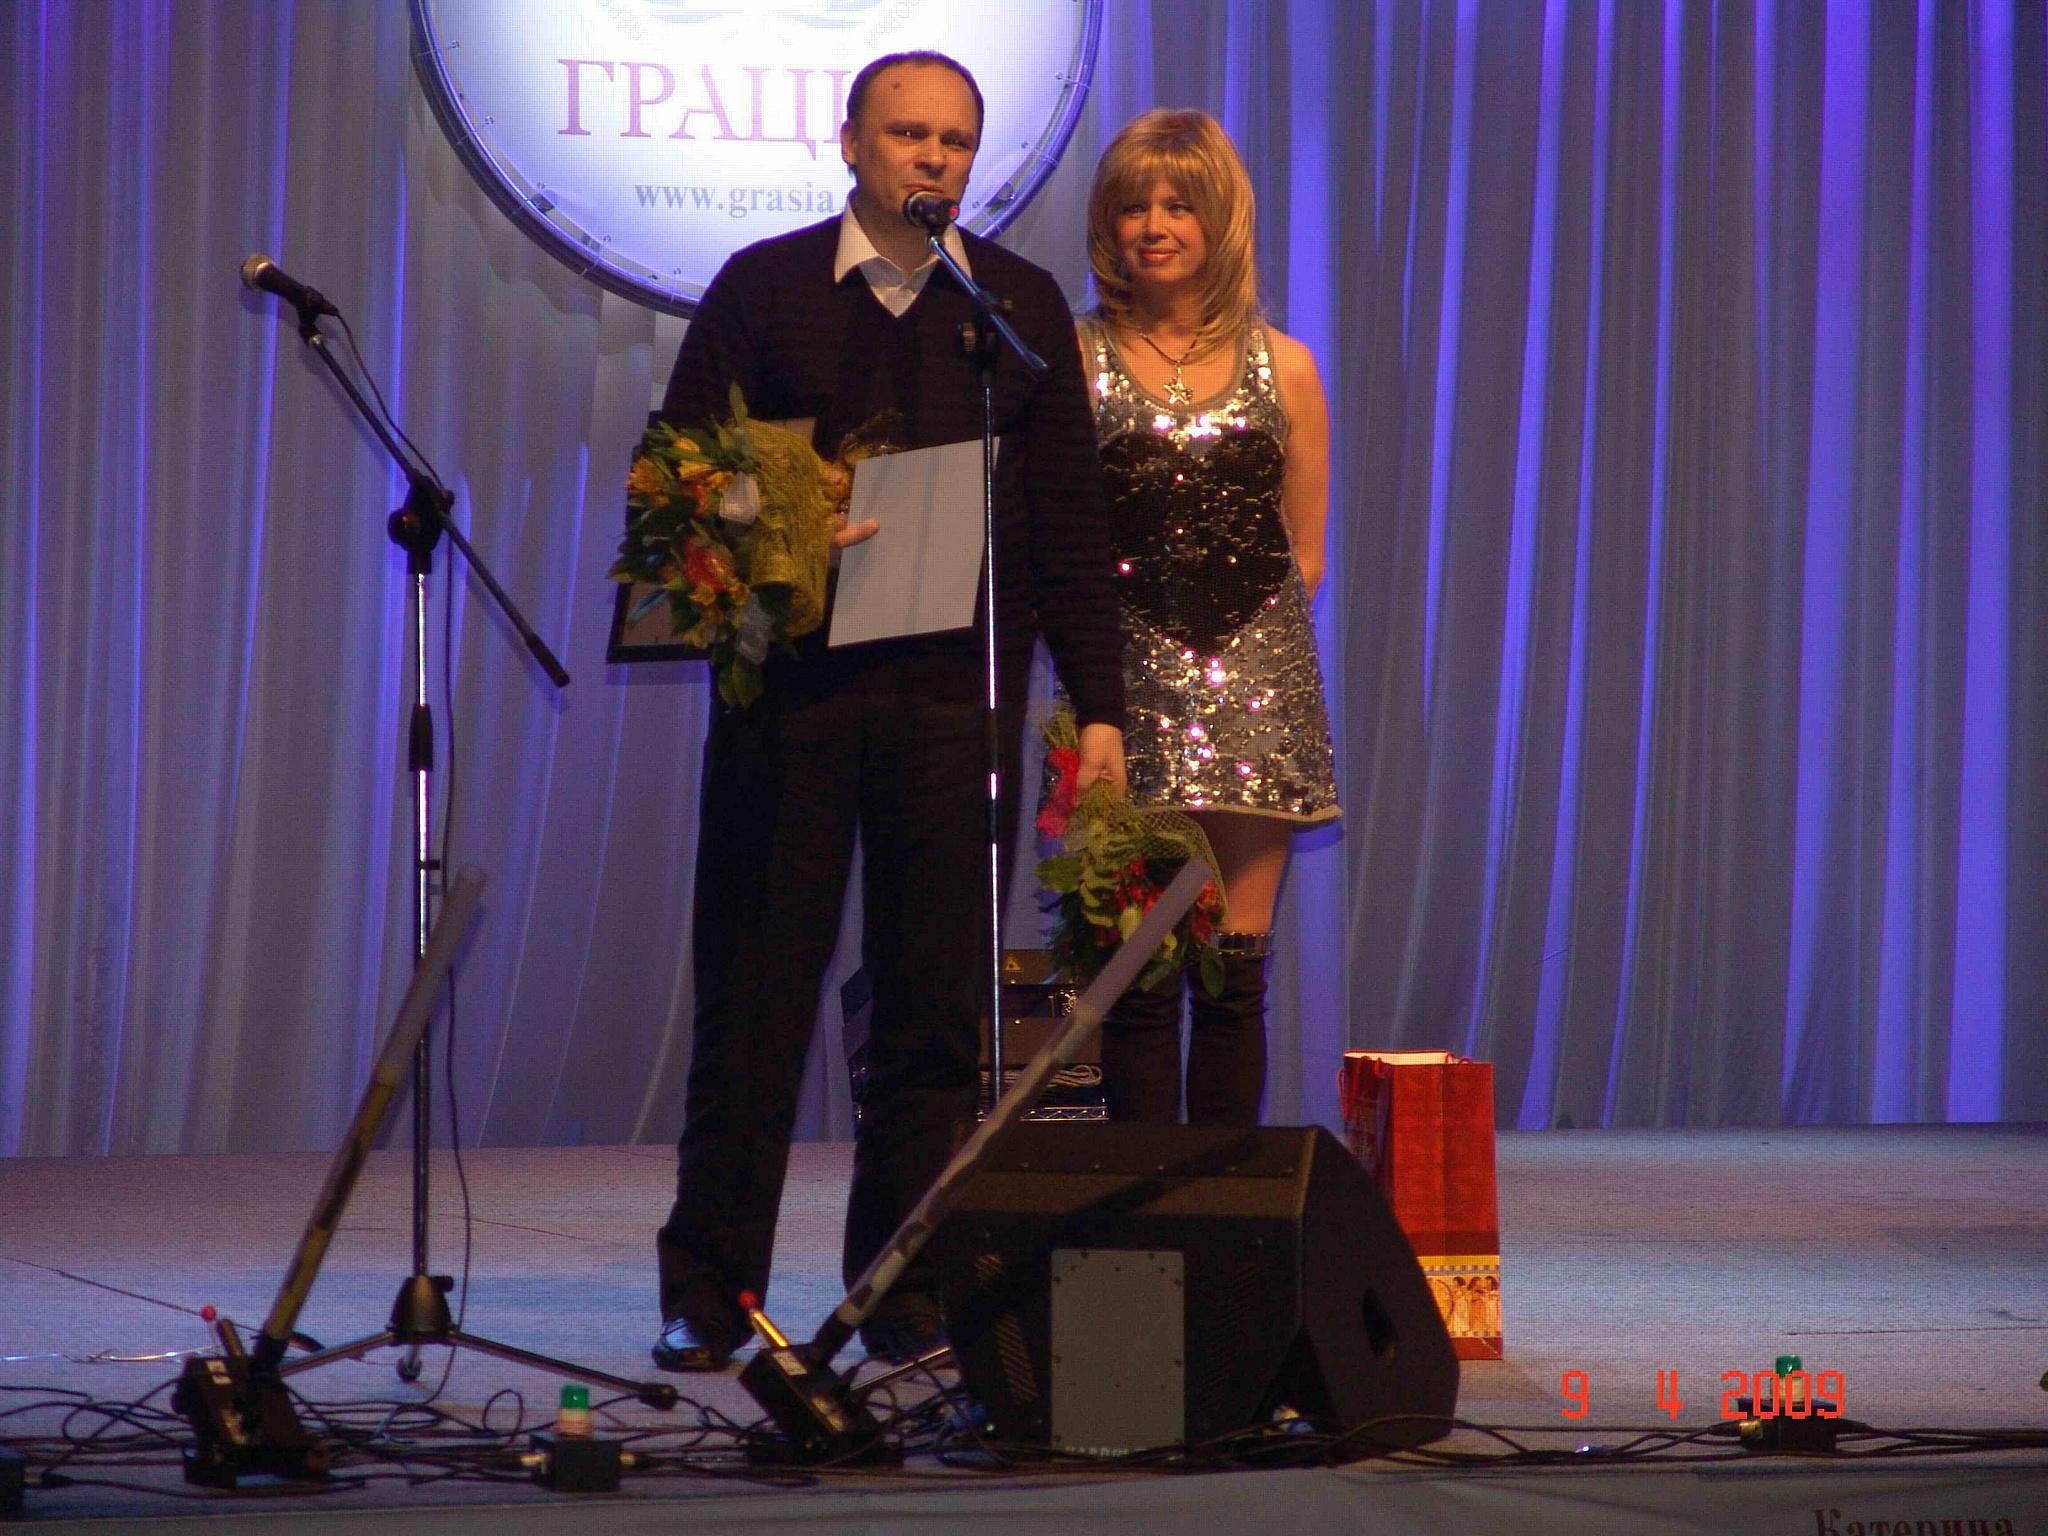 "Ю.А. Волынкин и Елена Преснякова (Самоцветы). Вручение премии ""Грация"